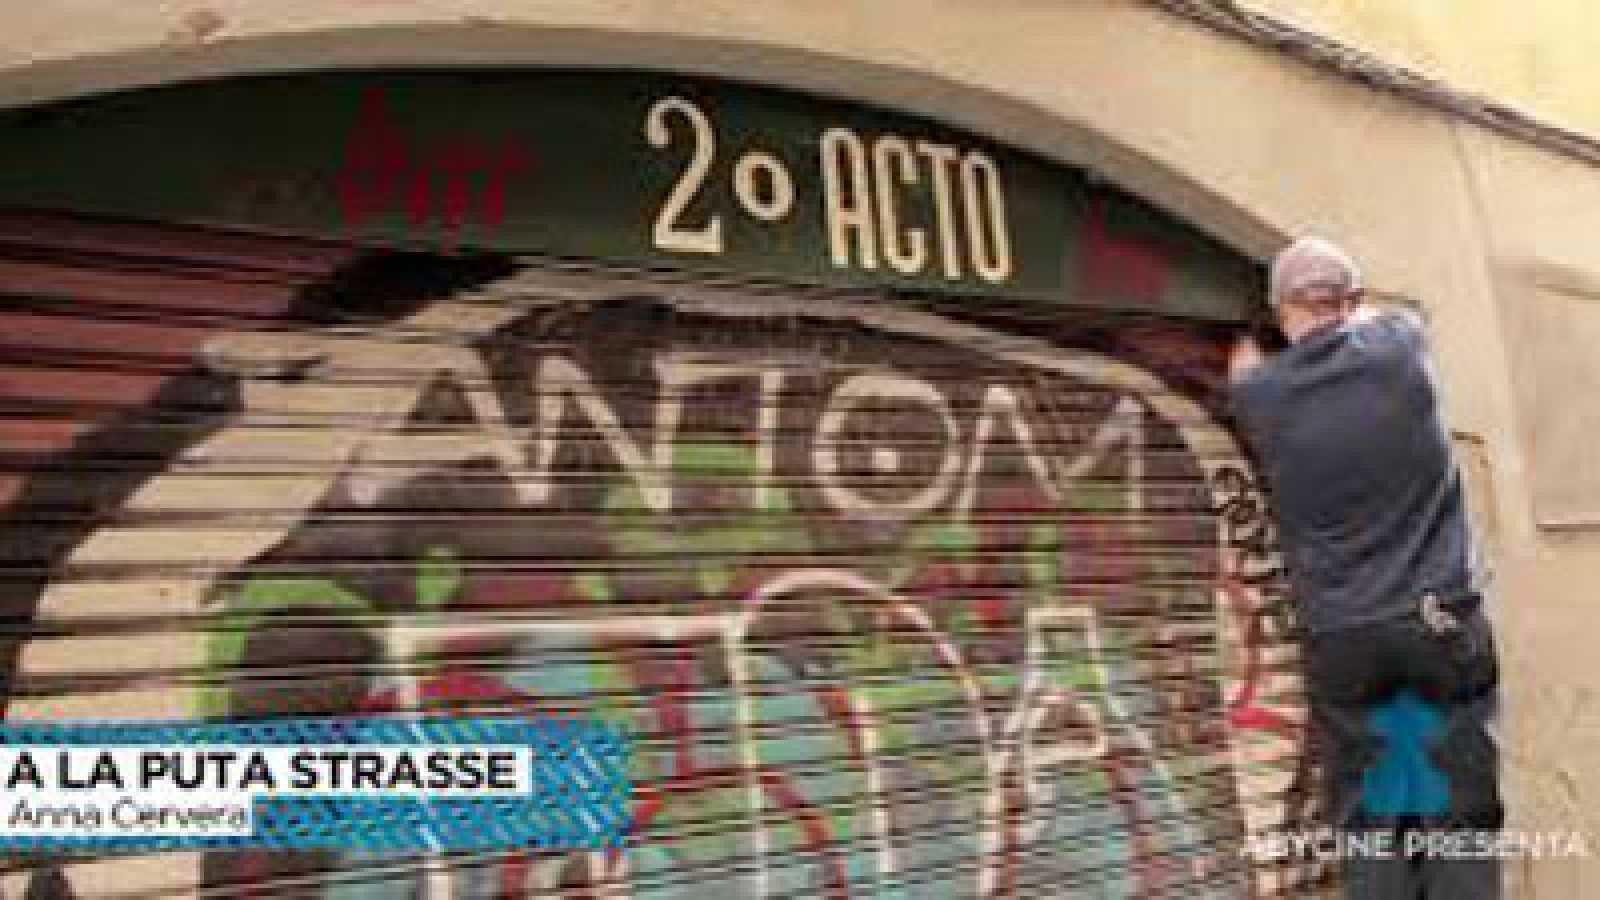 Territori clandestí - Barcelona s'està desBarcerlonitzant